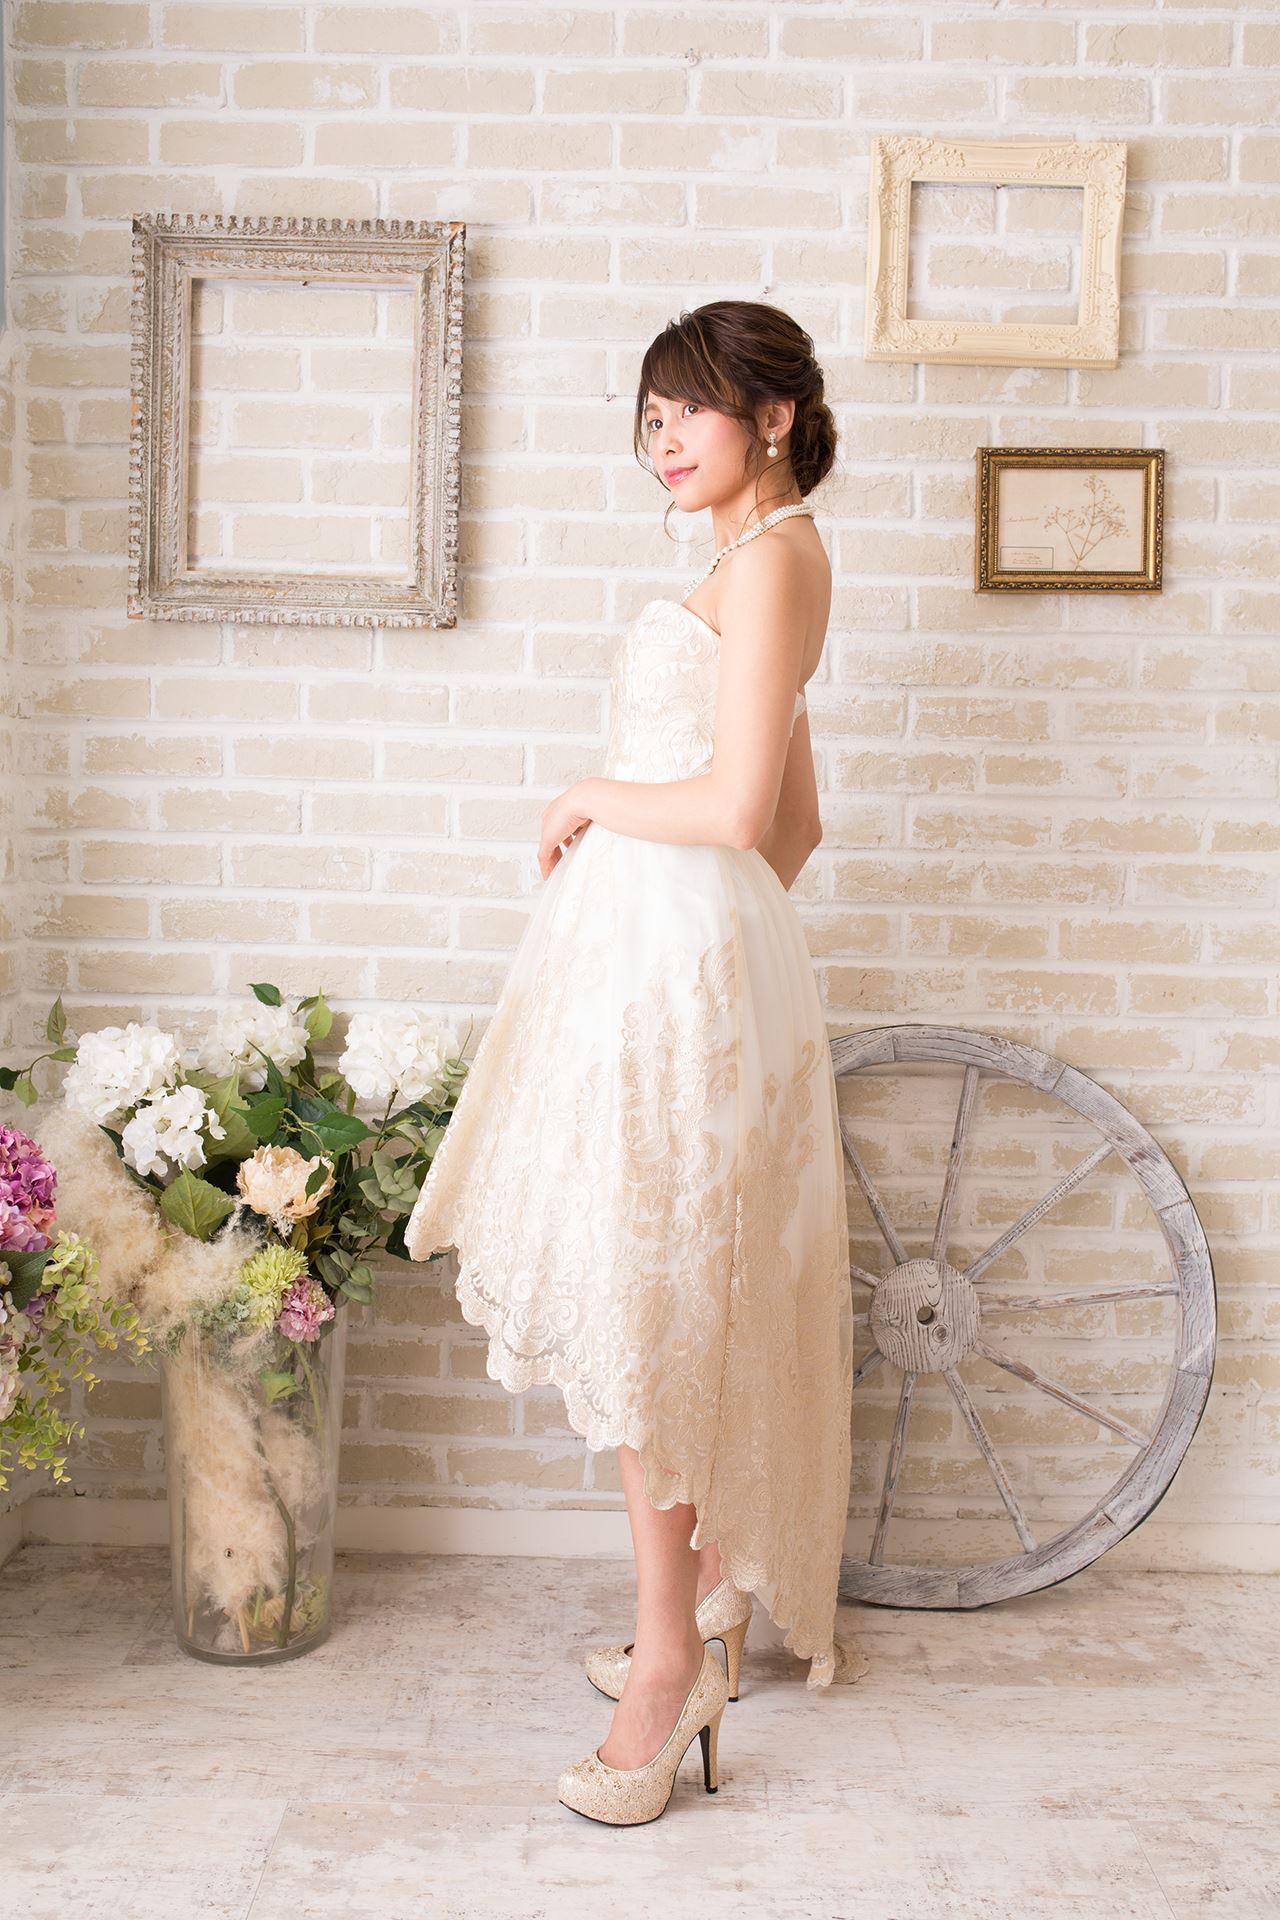 yk_nr_dress_417